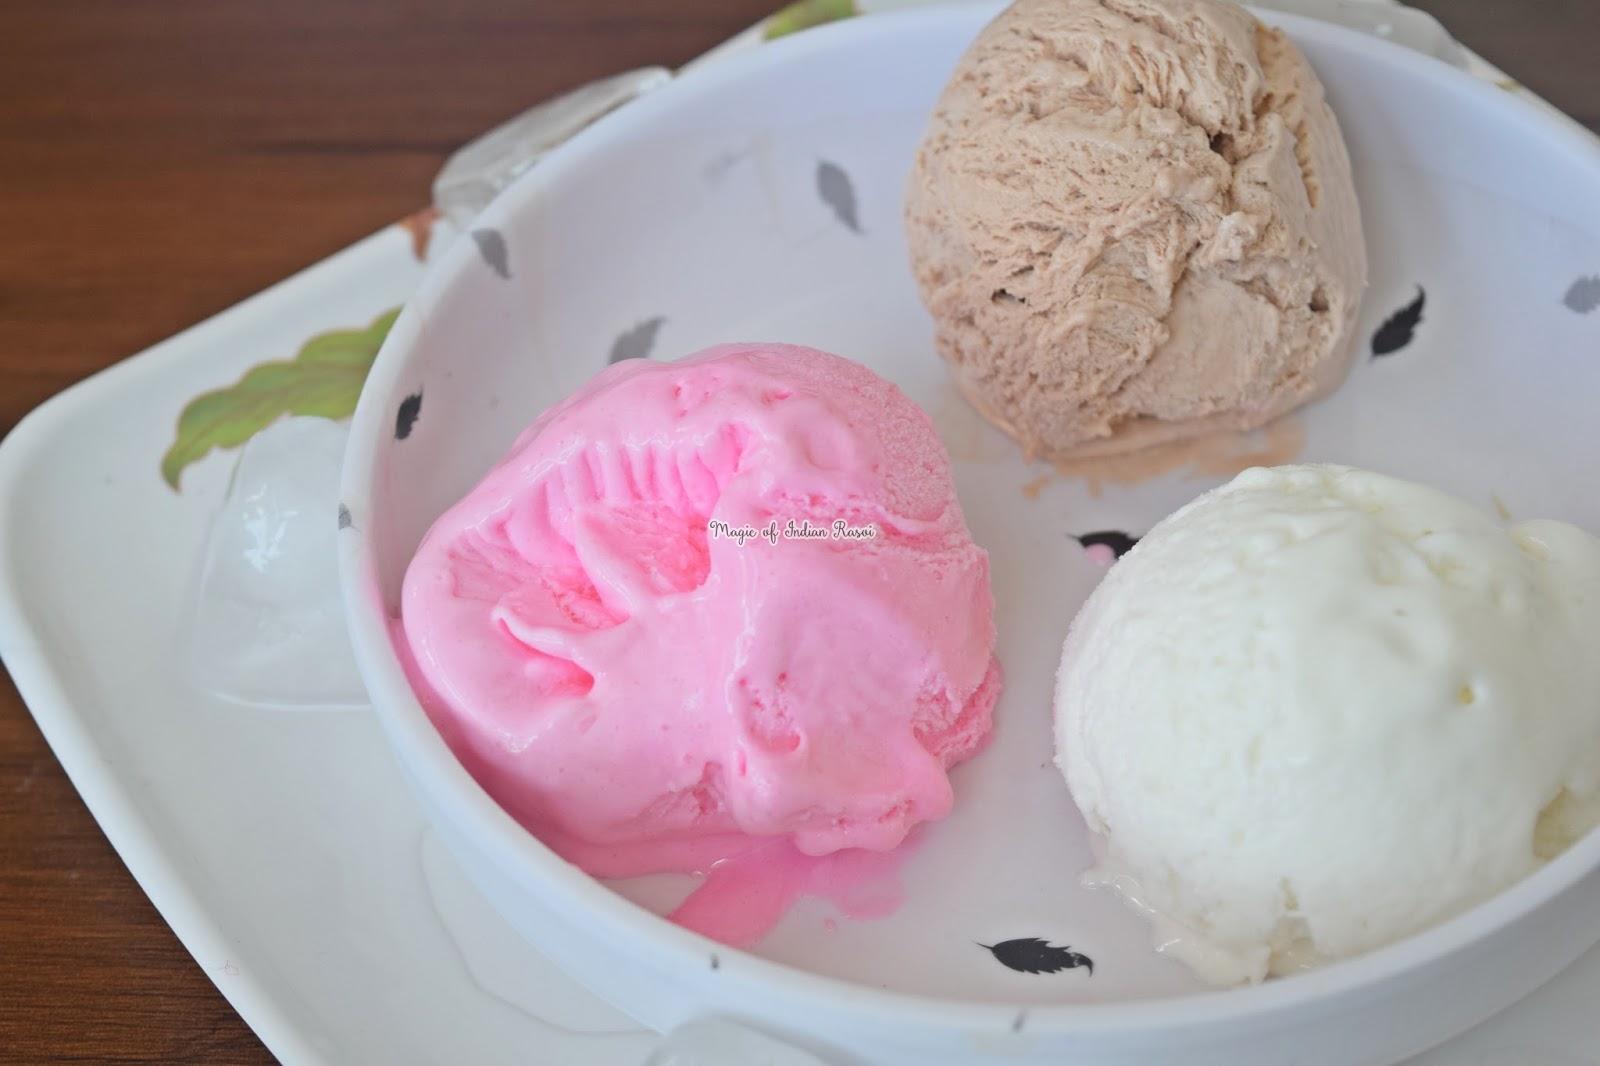 Best Strawberry Ice Cream Recipe - Creamy & Soft Homemade Ice Cream - बेस्ट स्ट्राबेरी आइस क्रीम रेसिपी - क्रीमी और सॉफ्ट होममेड आइस क्रीम - Priya R - Magic of Indian Rasoi